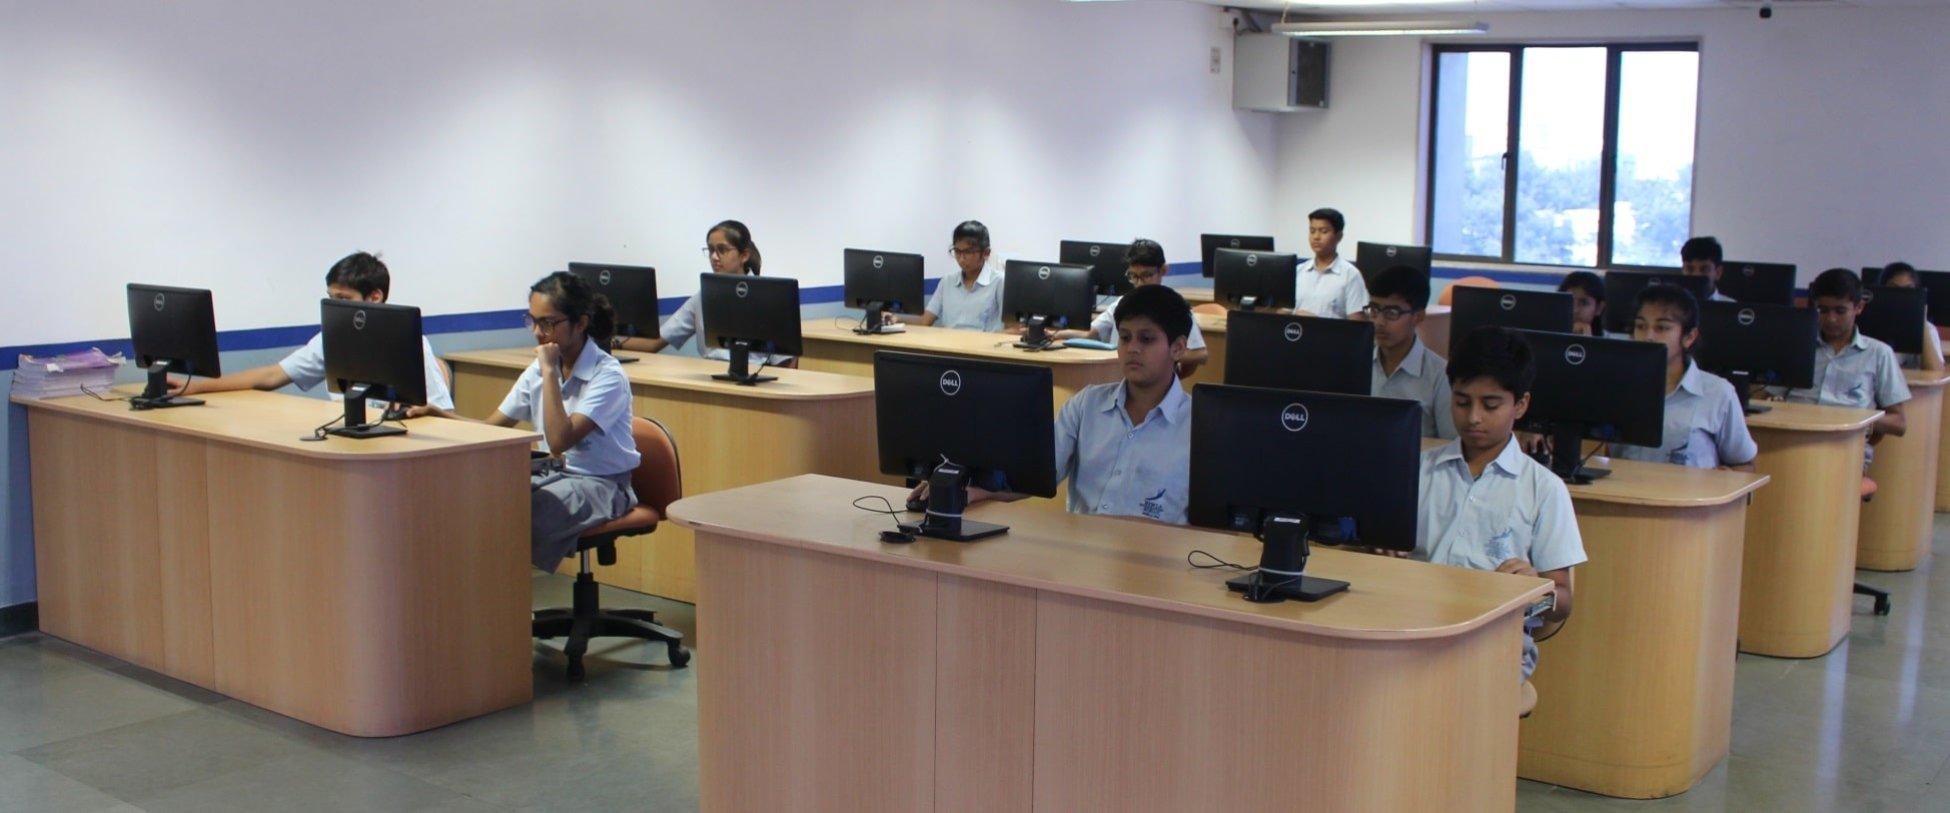 Birla classroom 01